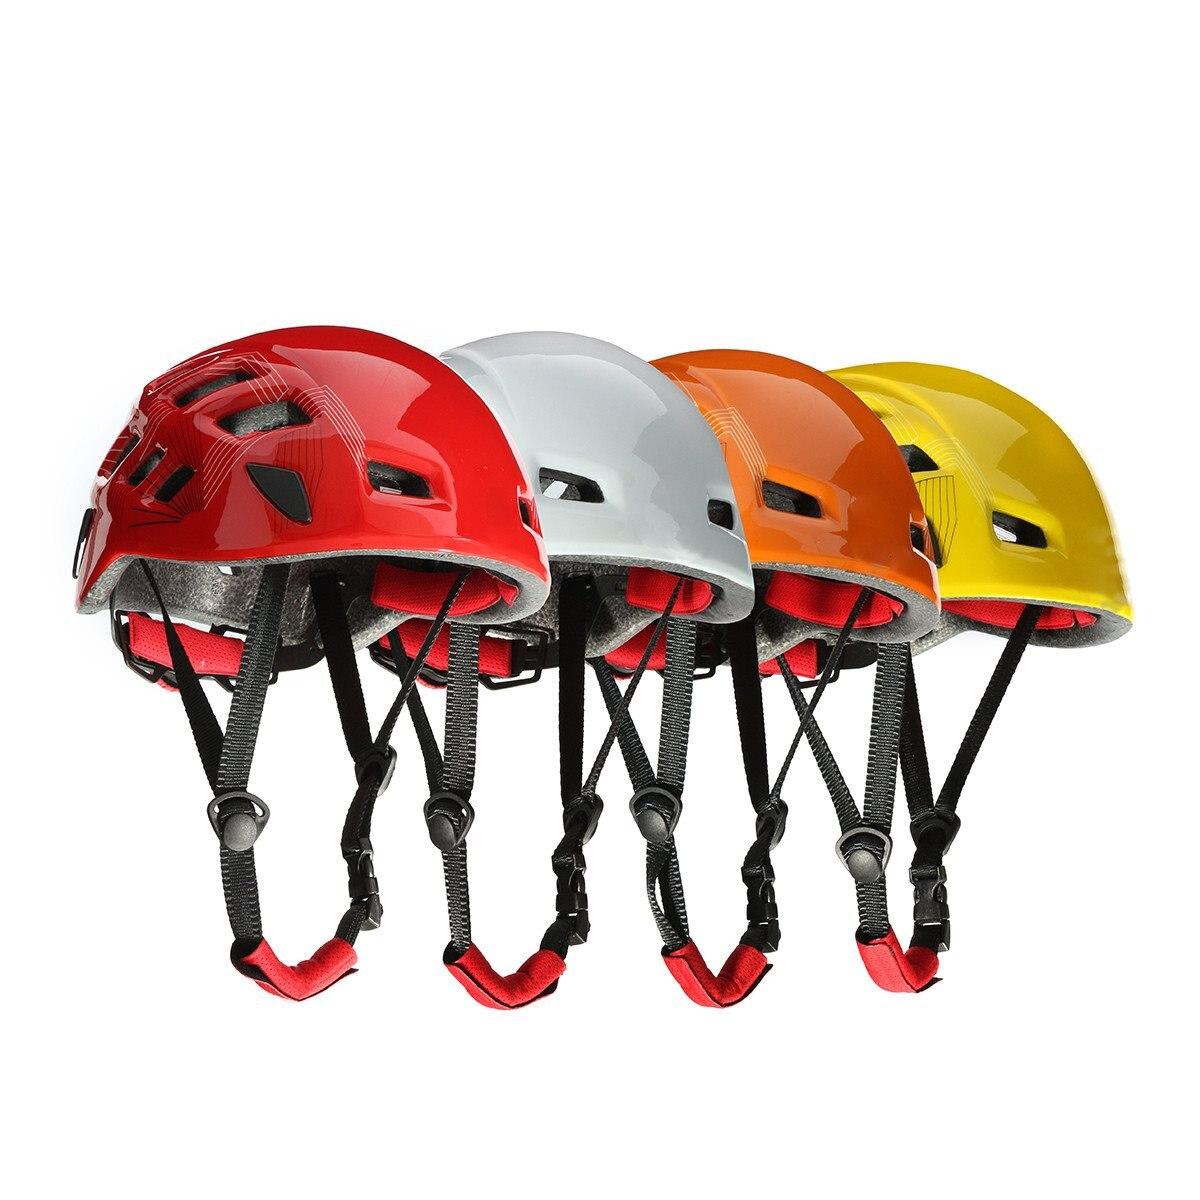 1pcs Poly Carbonate Rock Climbing Helmets Outdoor Sport Rescue Helmet ightweight Climbing wall Accessories